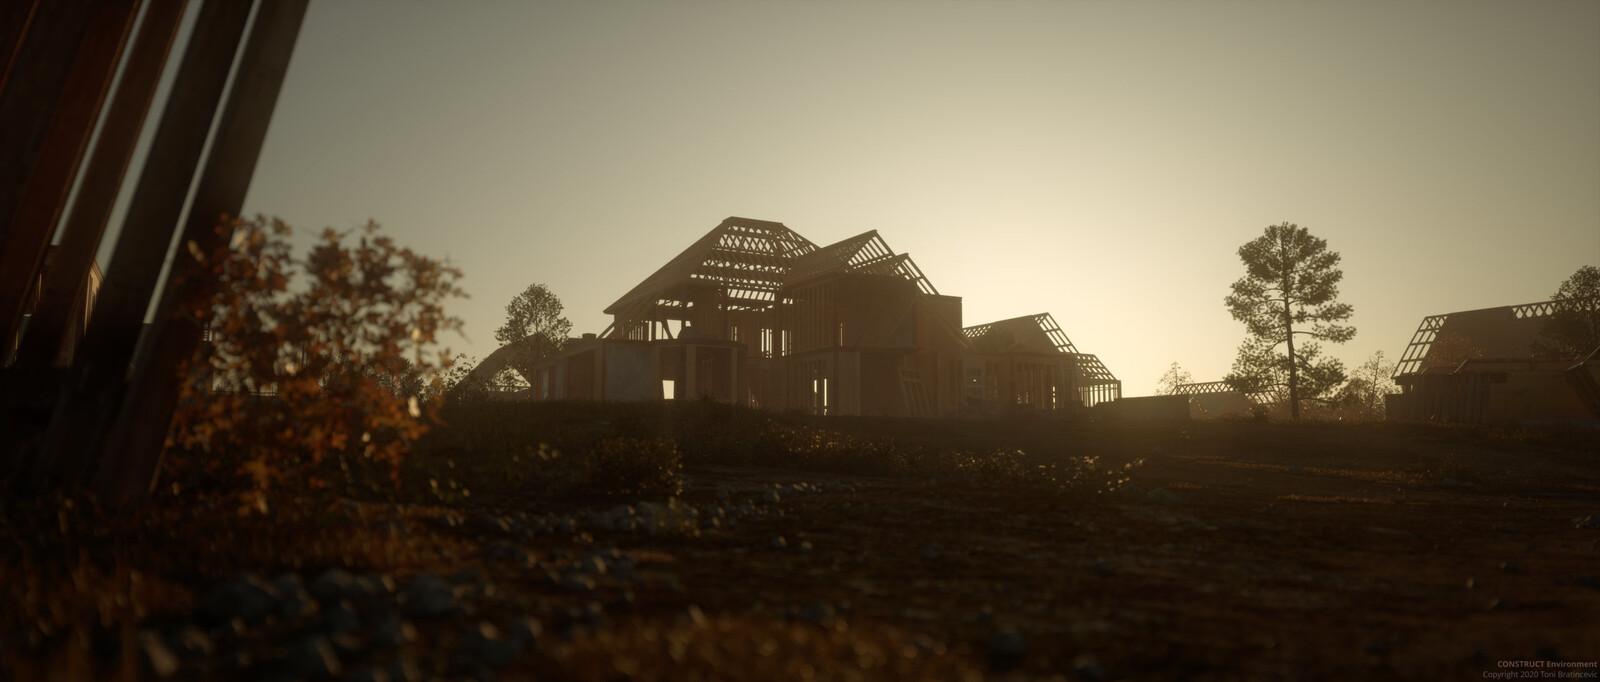 Construct Environment solo